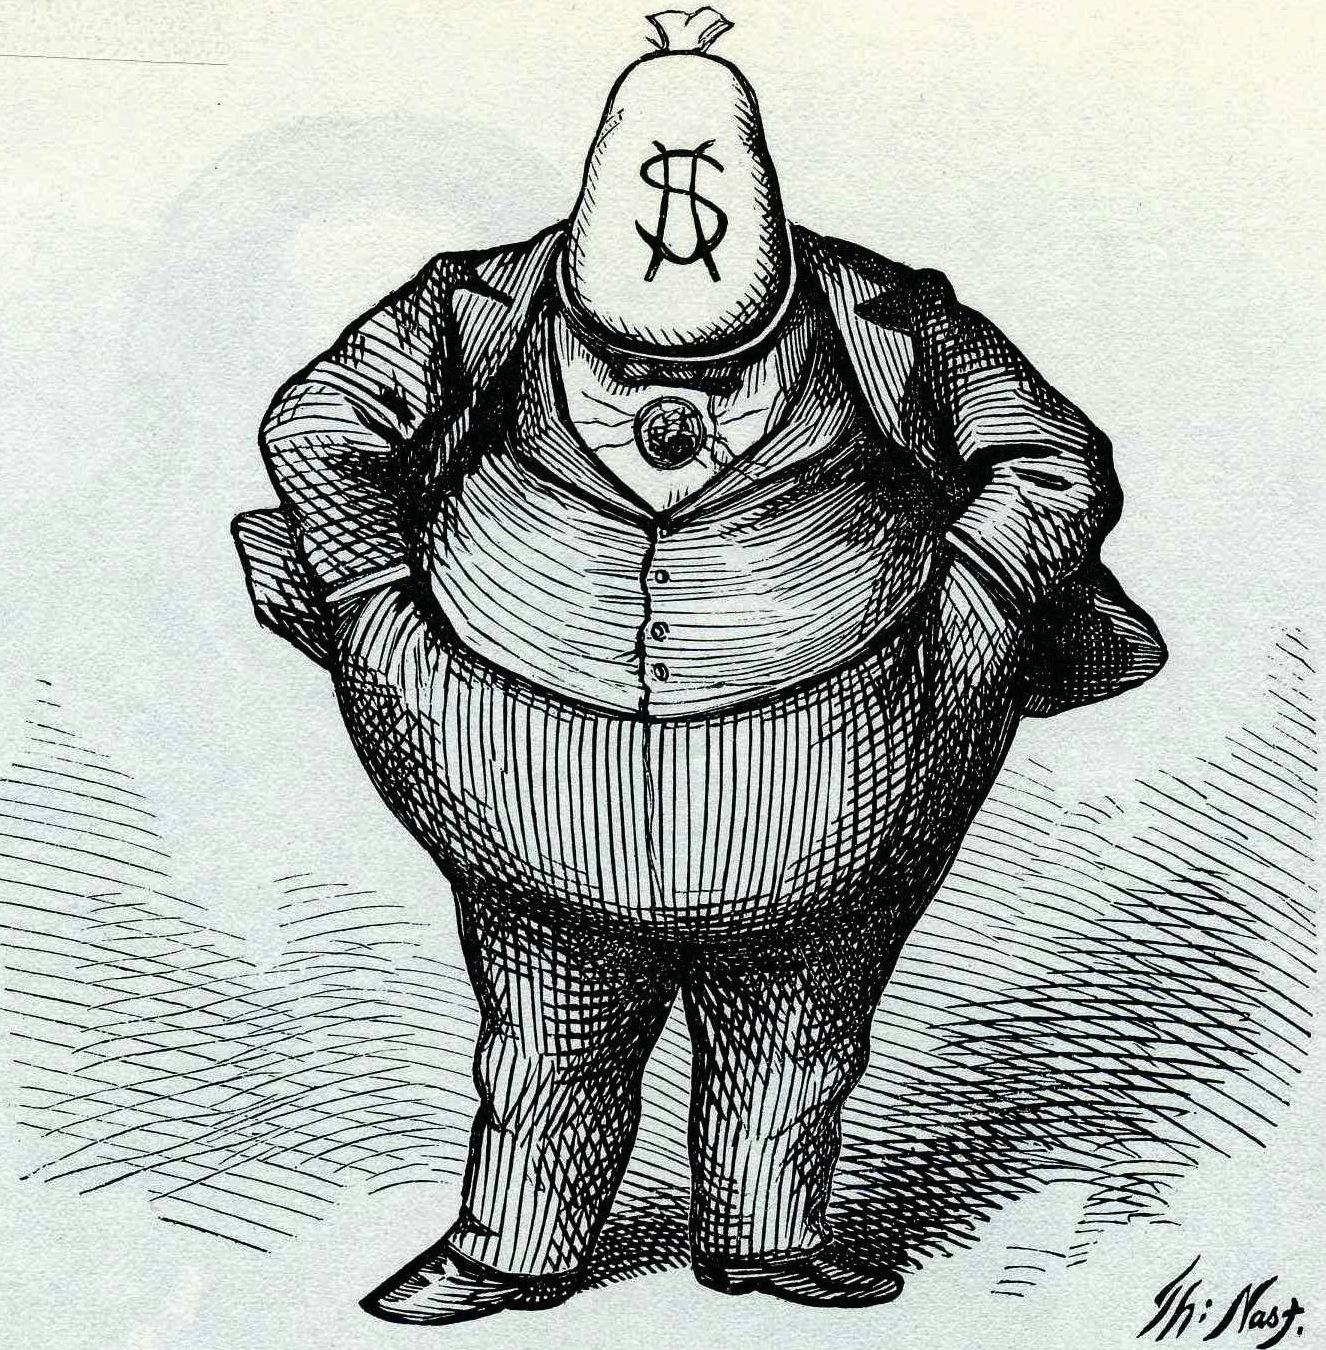 greed machine loophole